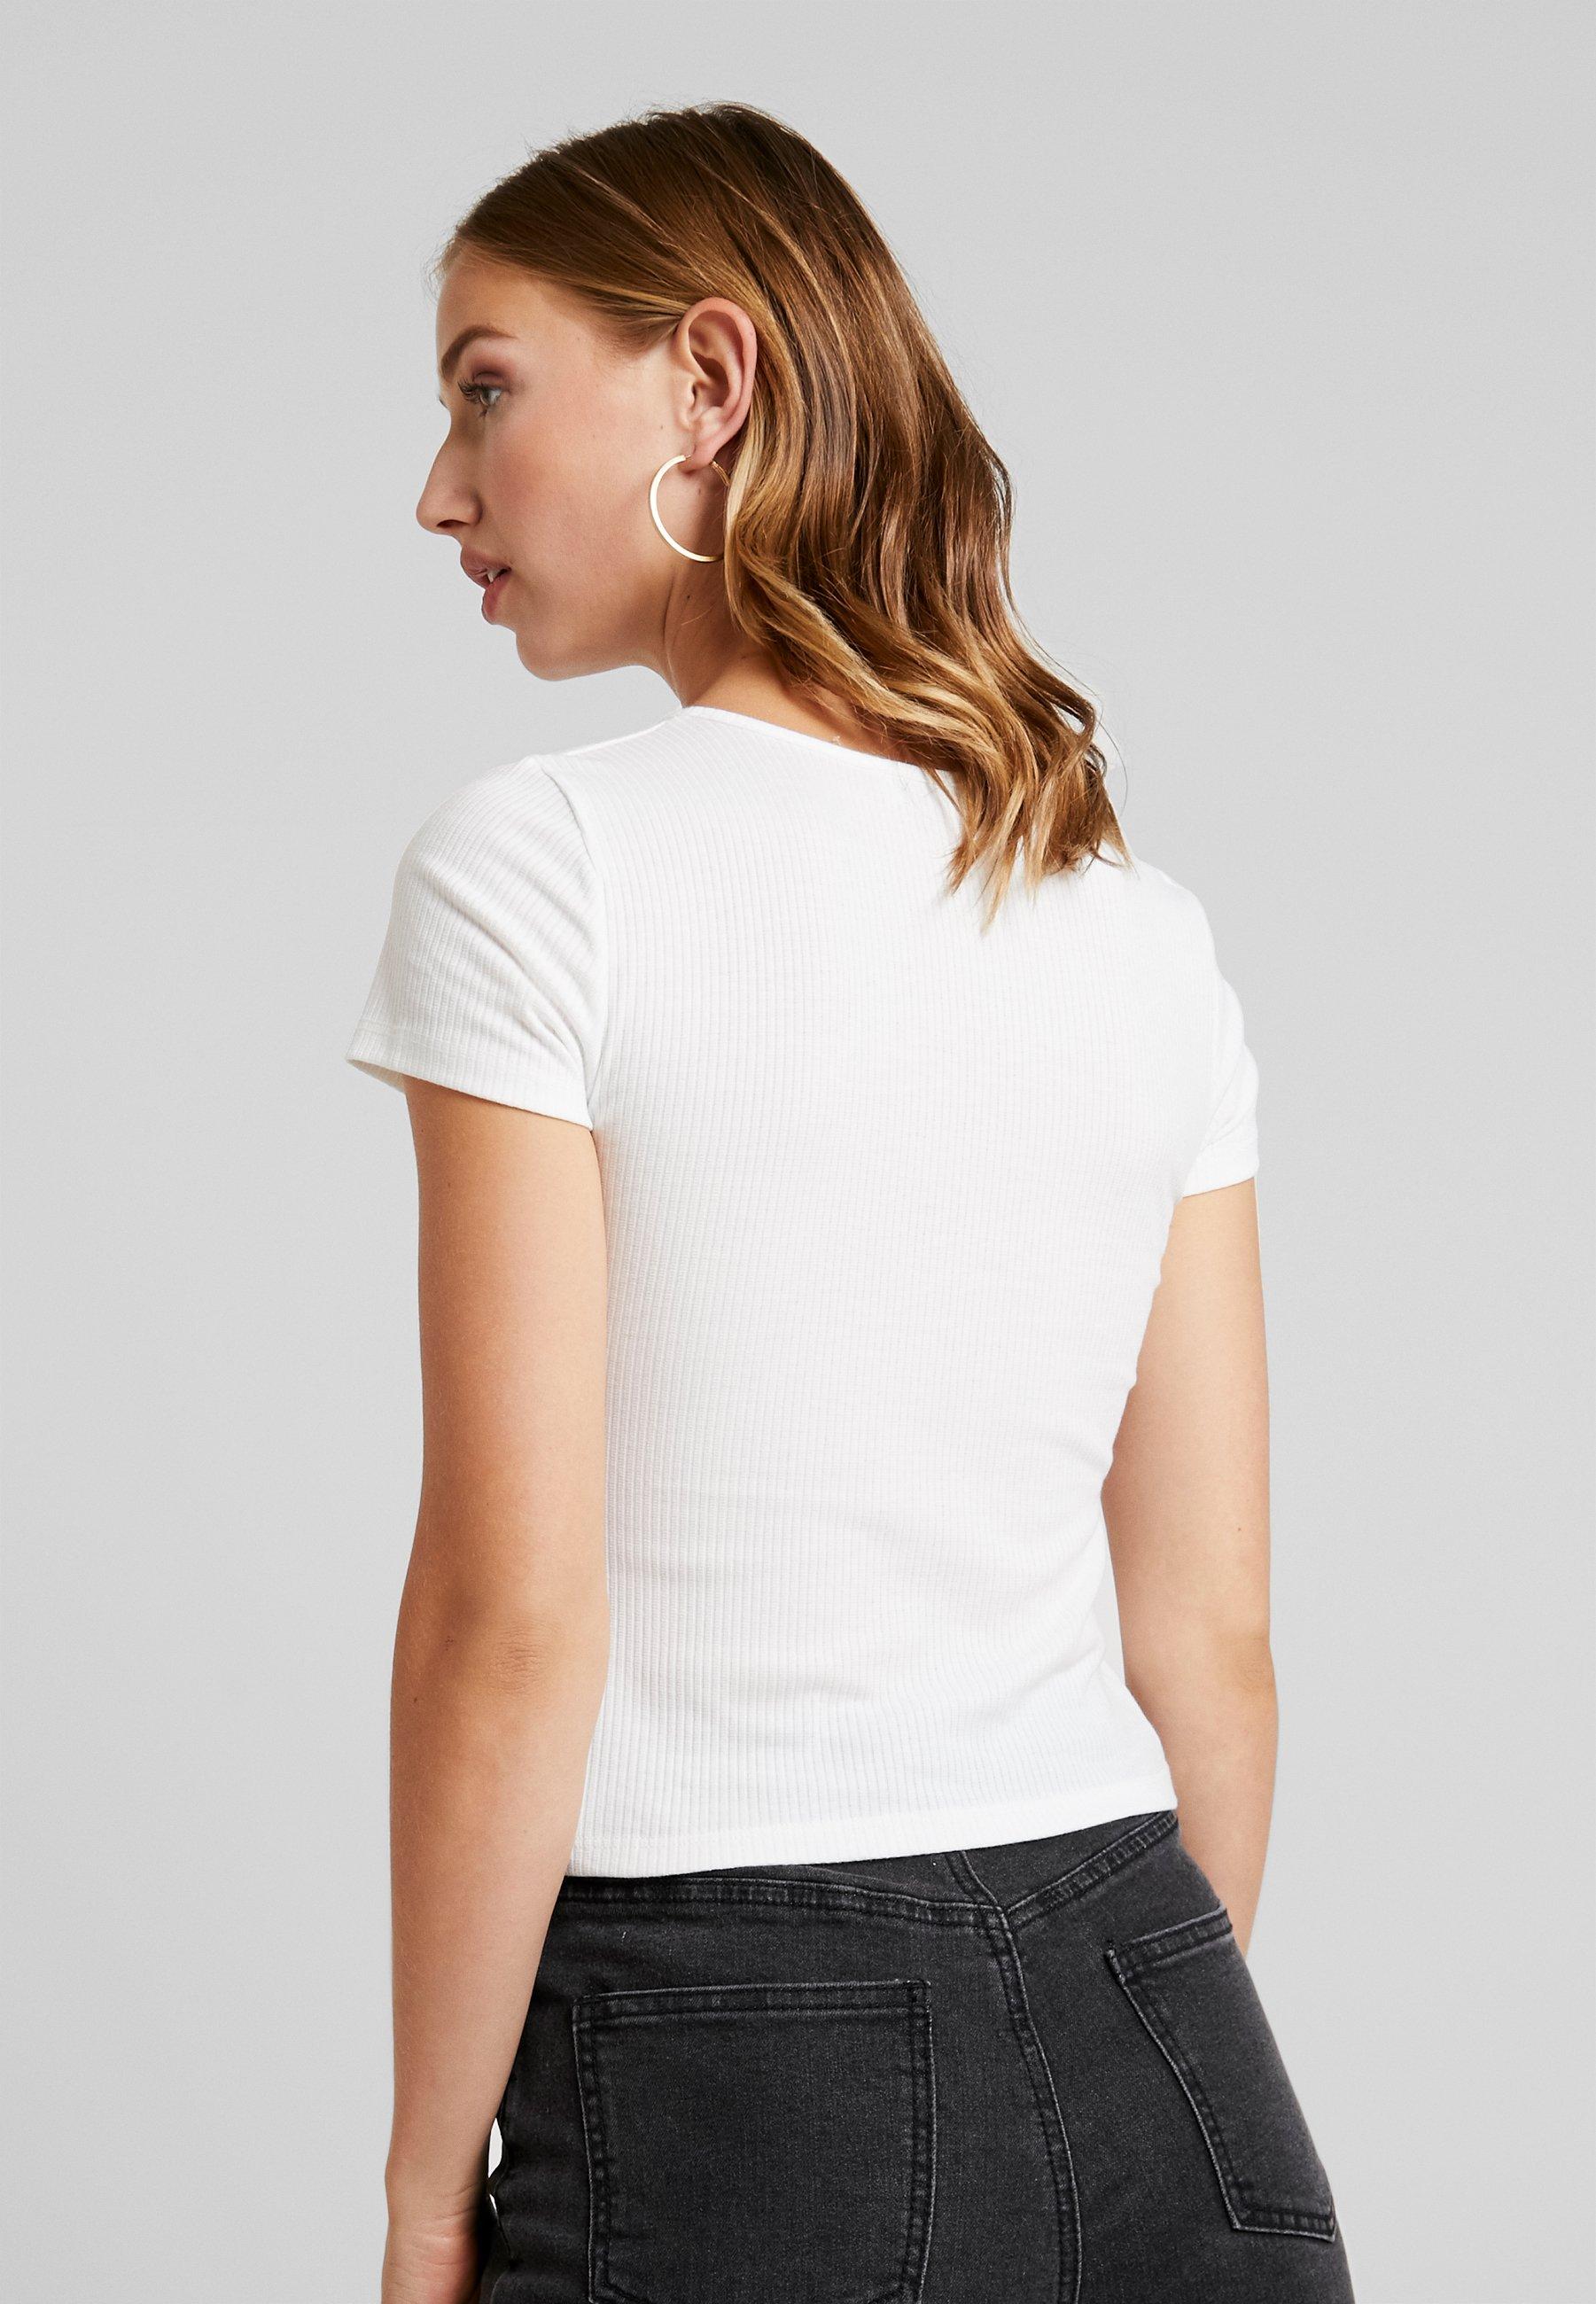 White CoSquare NeckT shirt Imprimé Hollister JKlFTc1